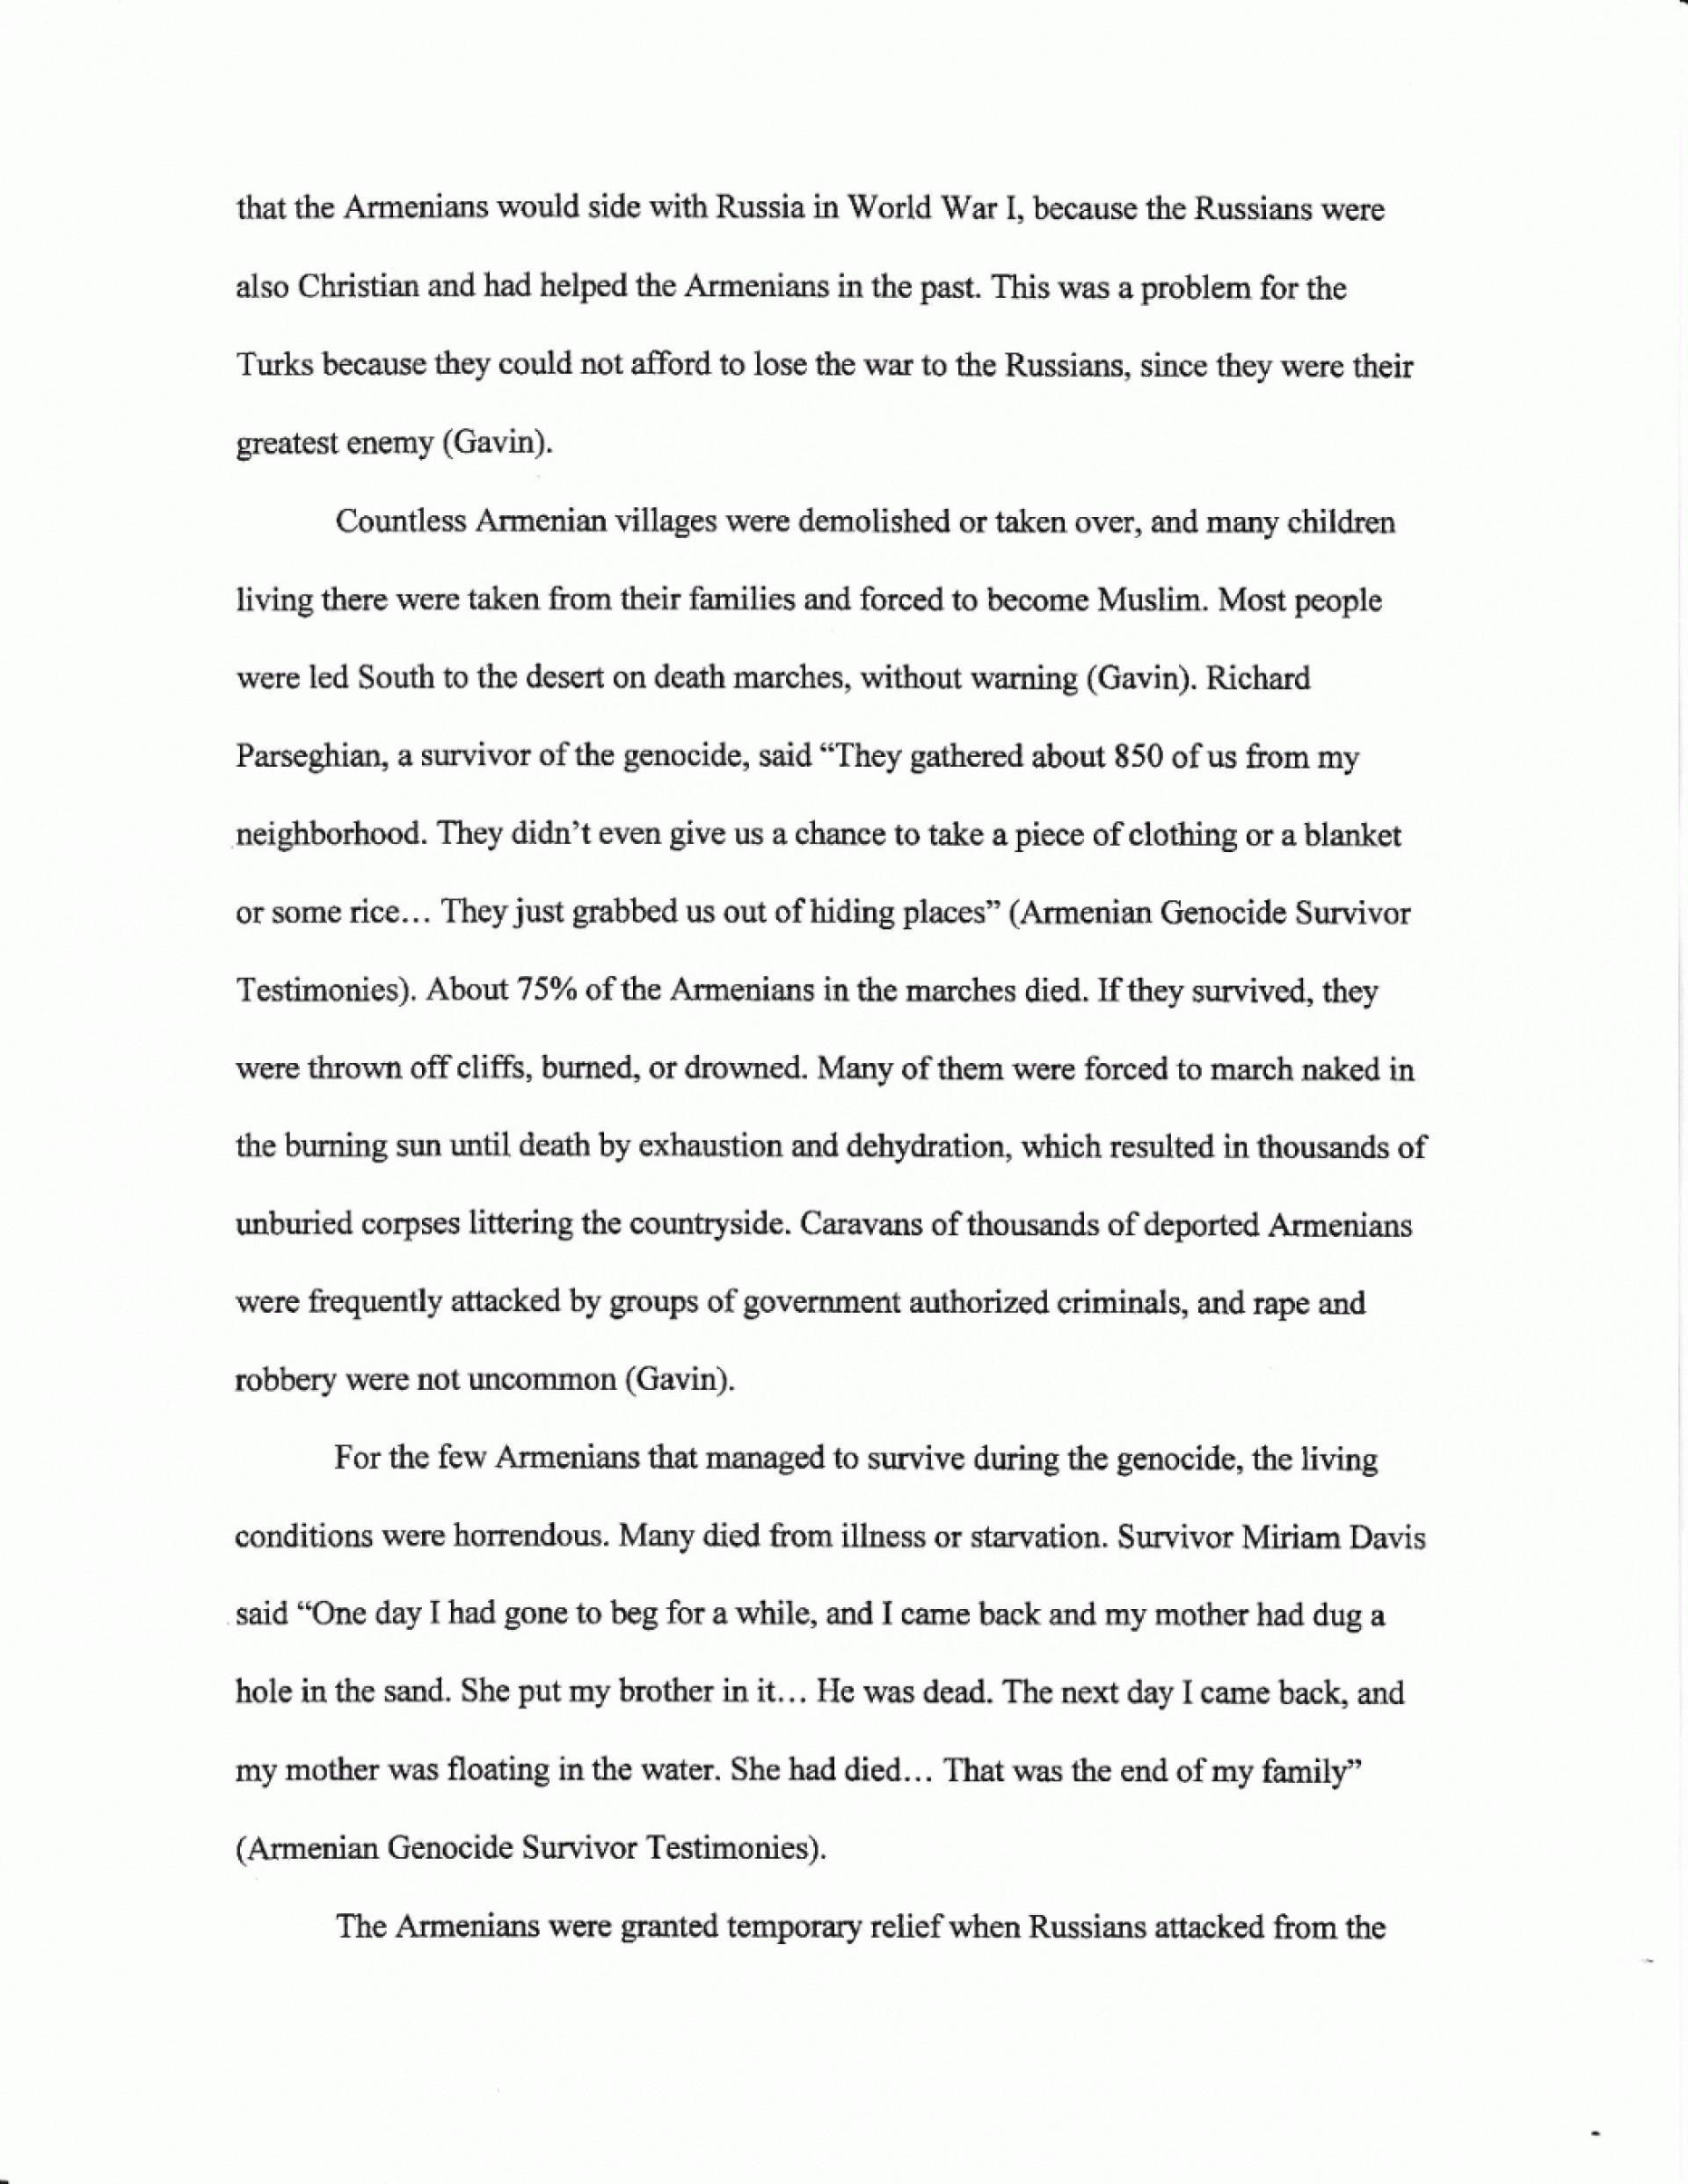 003 Easy Topics For Persuasive Essays Essay High R Schoolers School English Argumentative Students Uk Pdf Speech Funny Prompts 1048x1356 Example Imposing Christian 1920